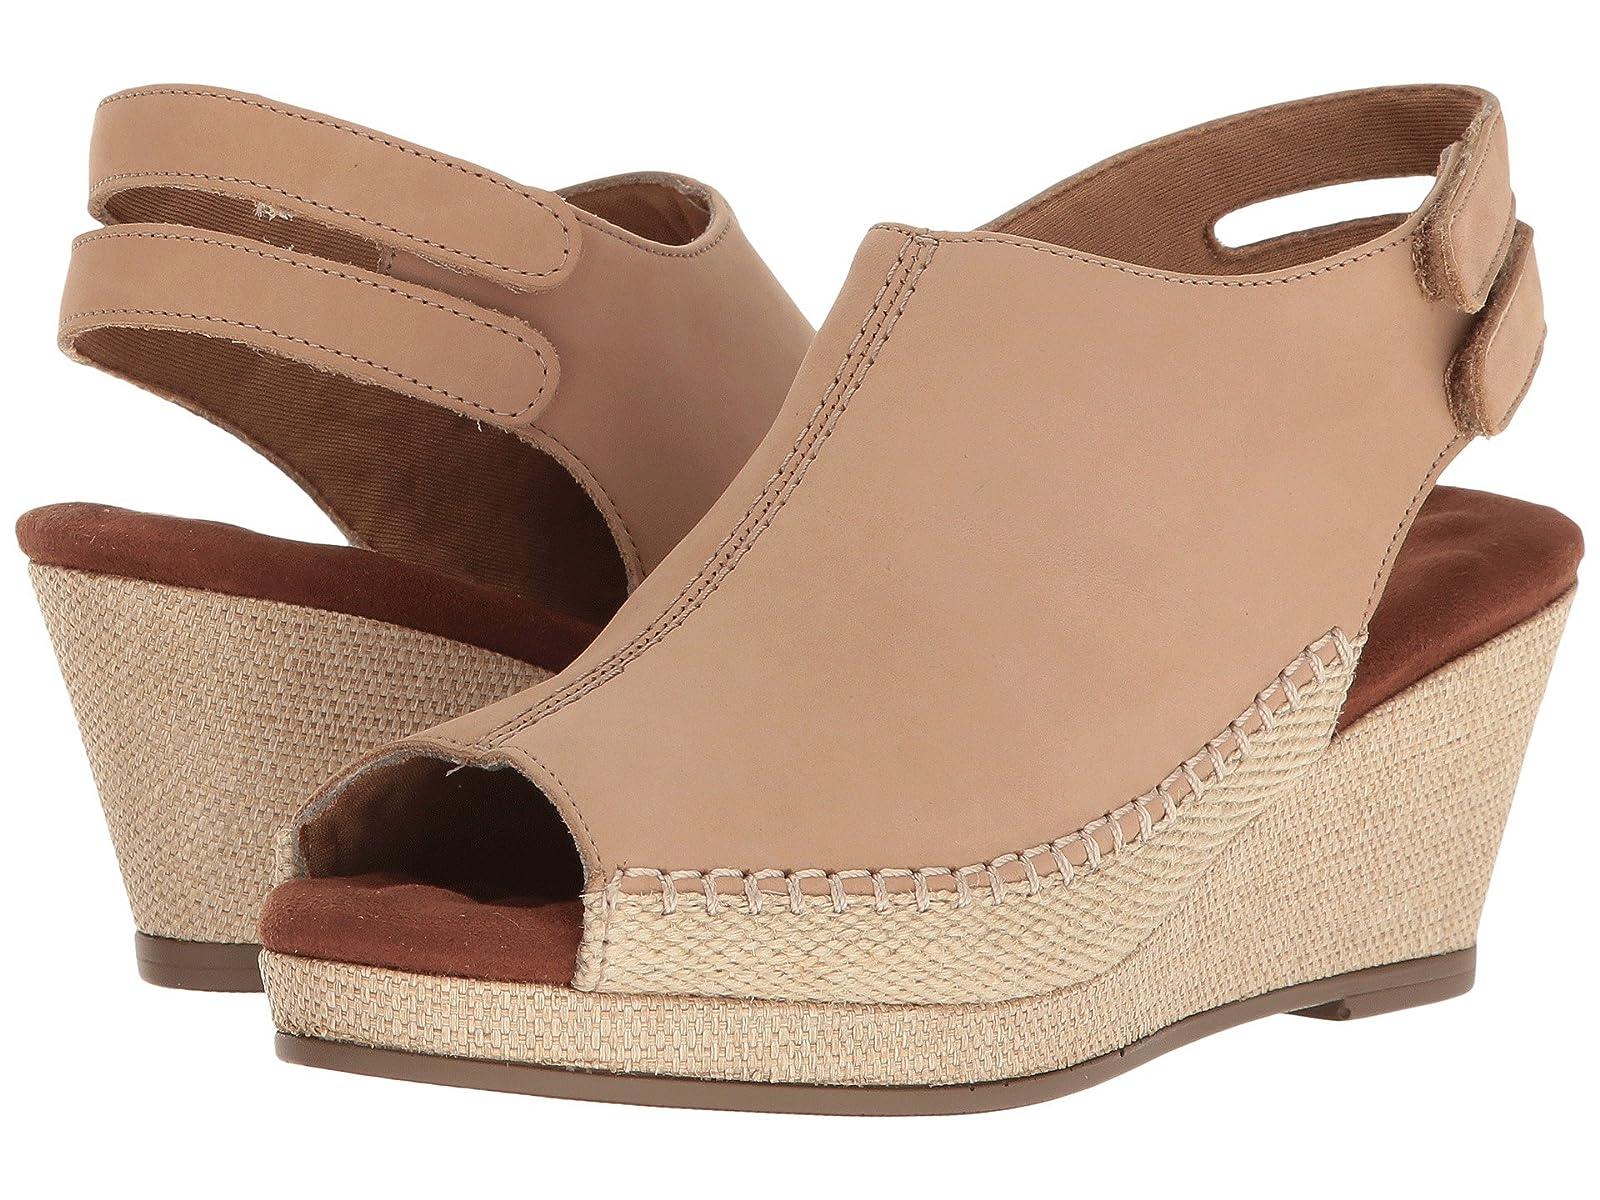 Walking Cradles AnikkaAtmospheric grades have affordable shoes